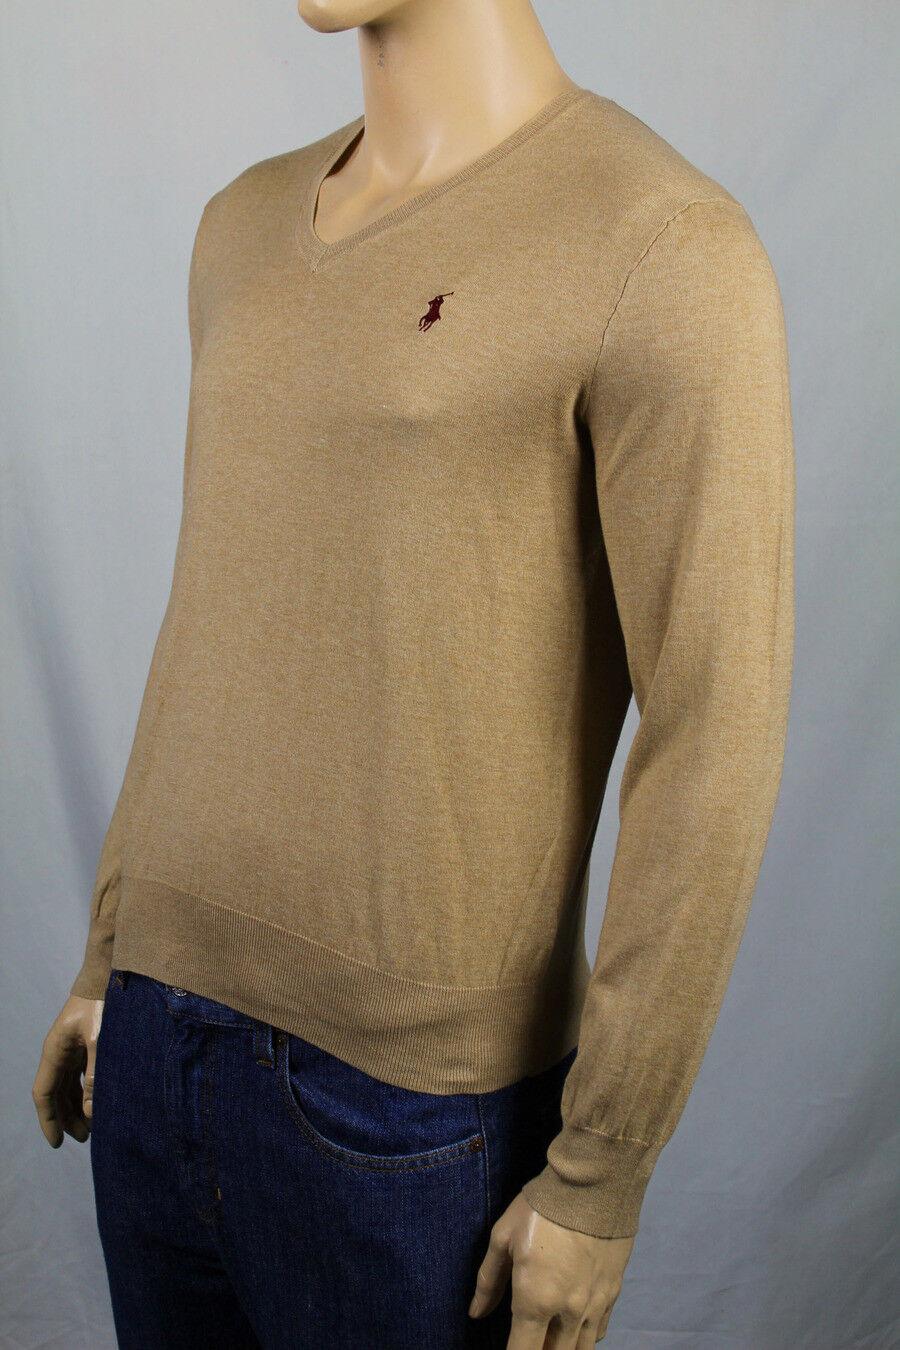 Polo Ralph Lauren Tan Pima Cotton Long Sleeve Sweater Burgundy Pony NWT